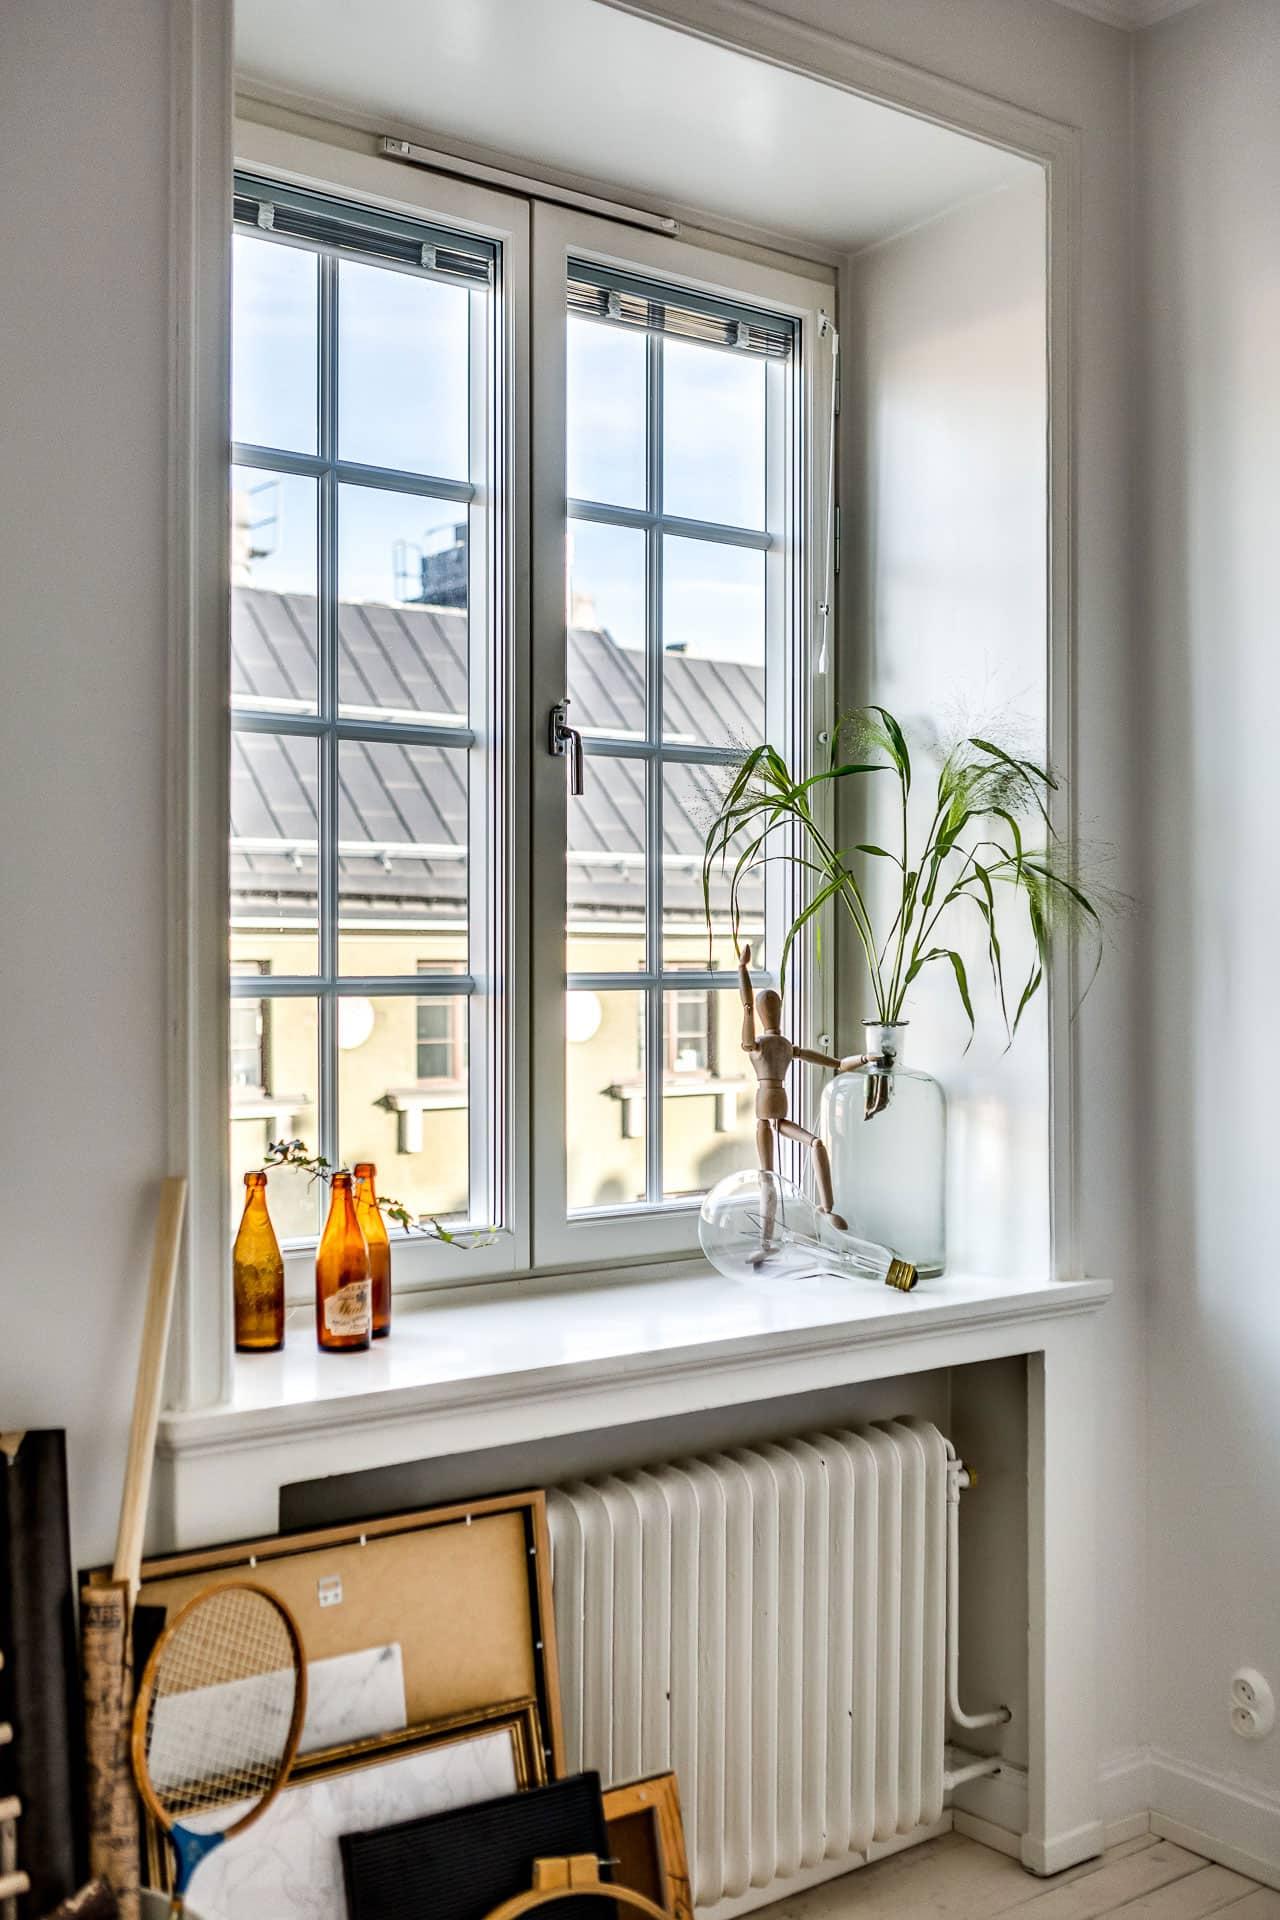 Hemmakontor, Monica Karlstein, Hemmafixbloggen.se